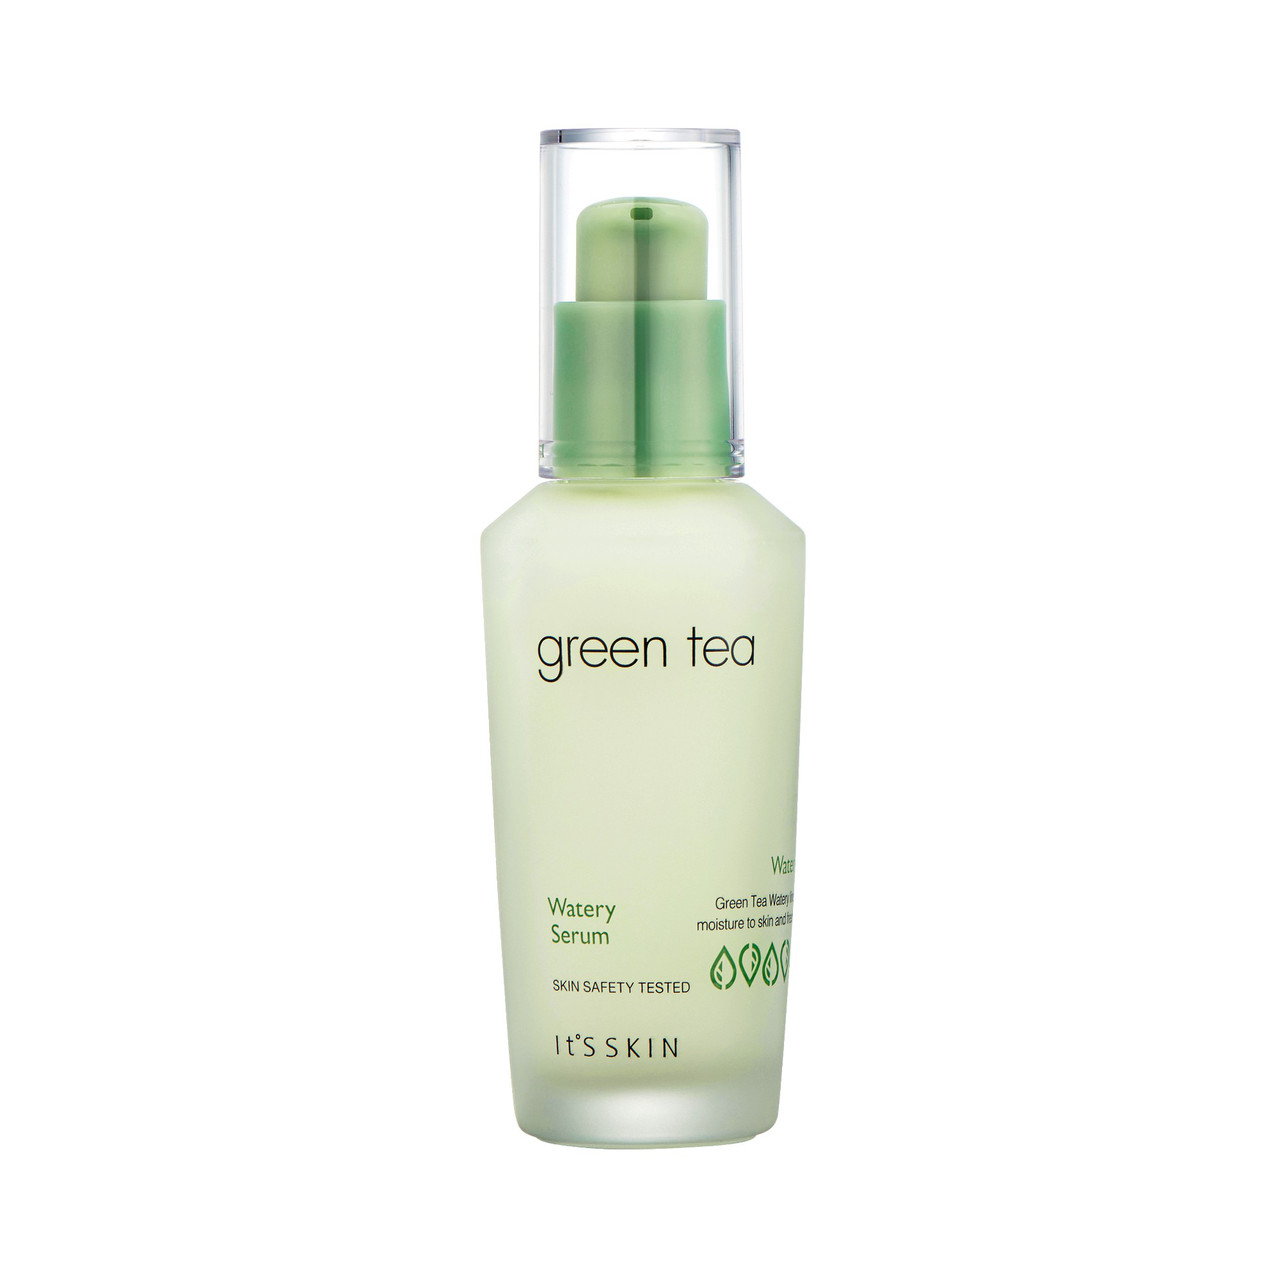 Сыворотка с зеленым чаем It's Skin Green Tea Watery Serum